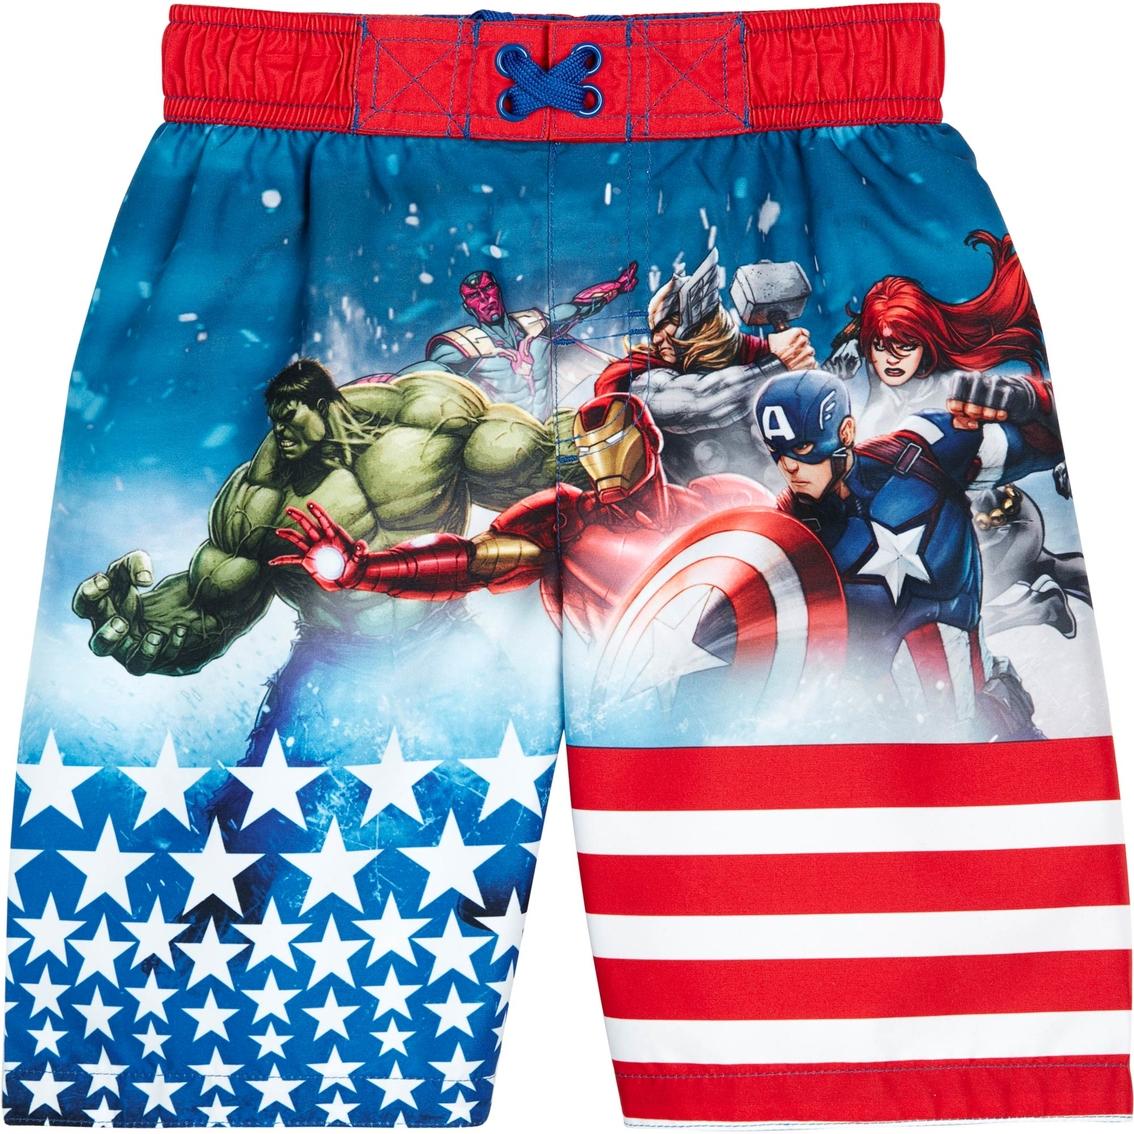 213ef22aa7a2a Avengers Little Boys Swim Trunk | Boys 4-7x | Apparel | Shop The ...